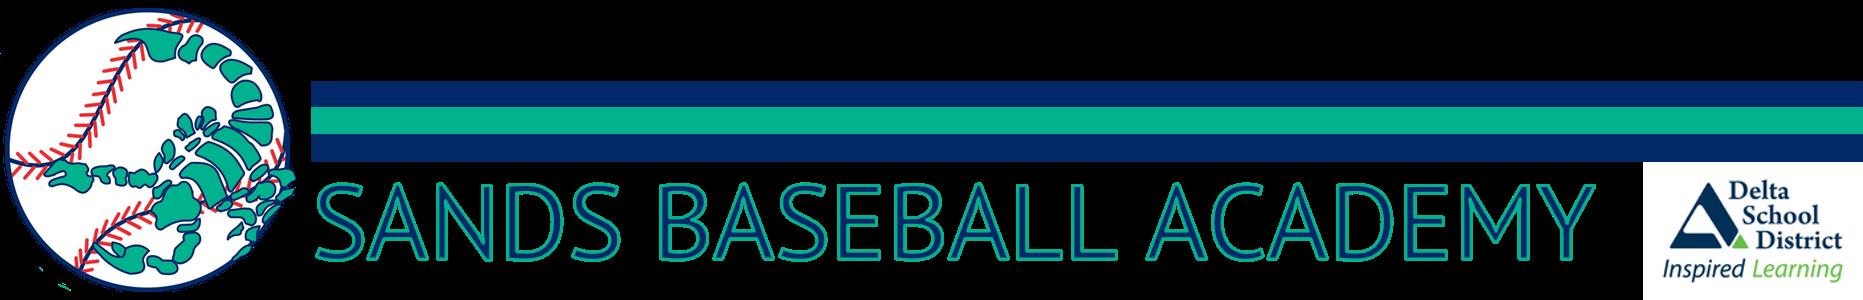 Sands Baseball Academy